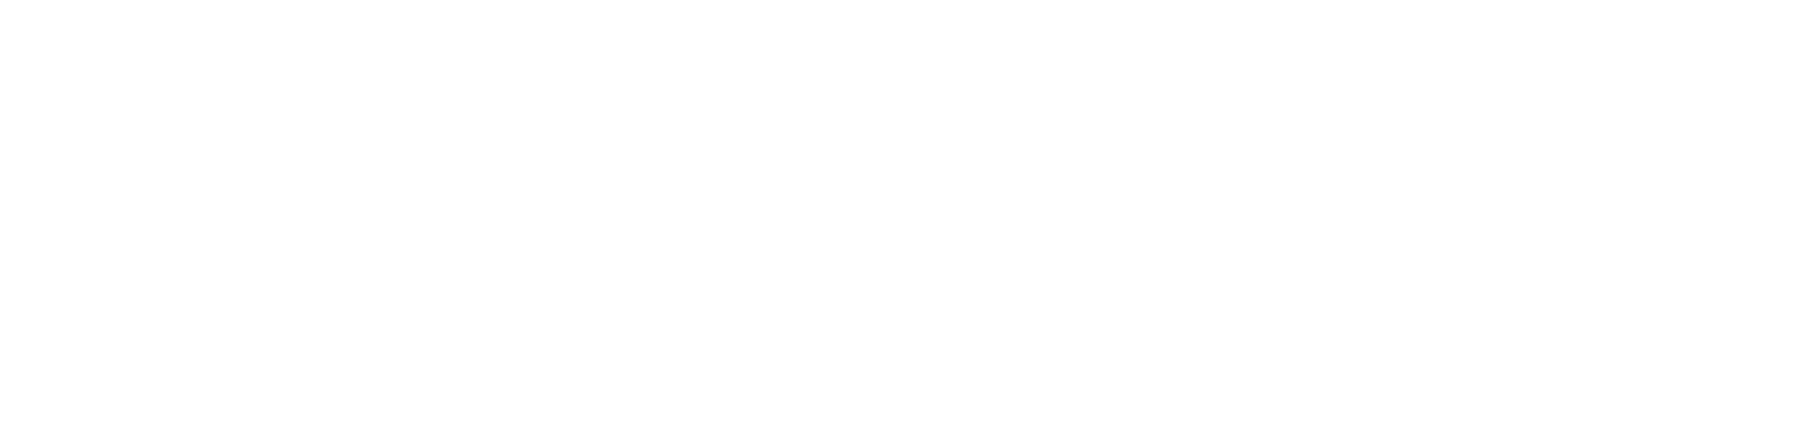 Premier marketplace logo